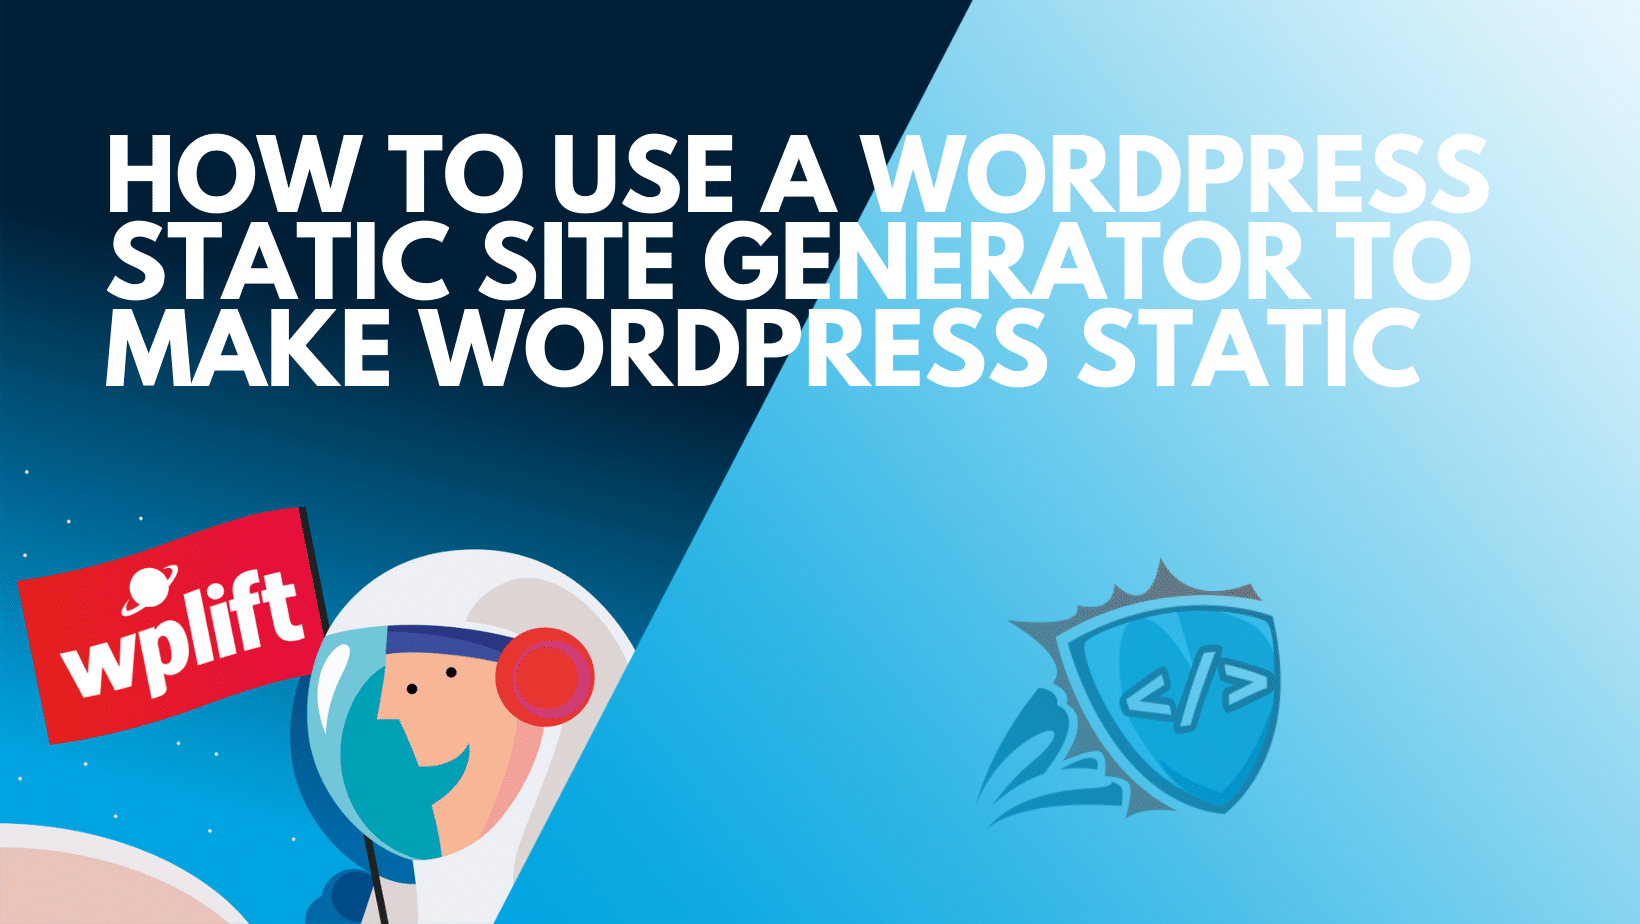 How to Use a WordPress Static Site Generator to Make WordPress Static